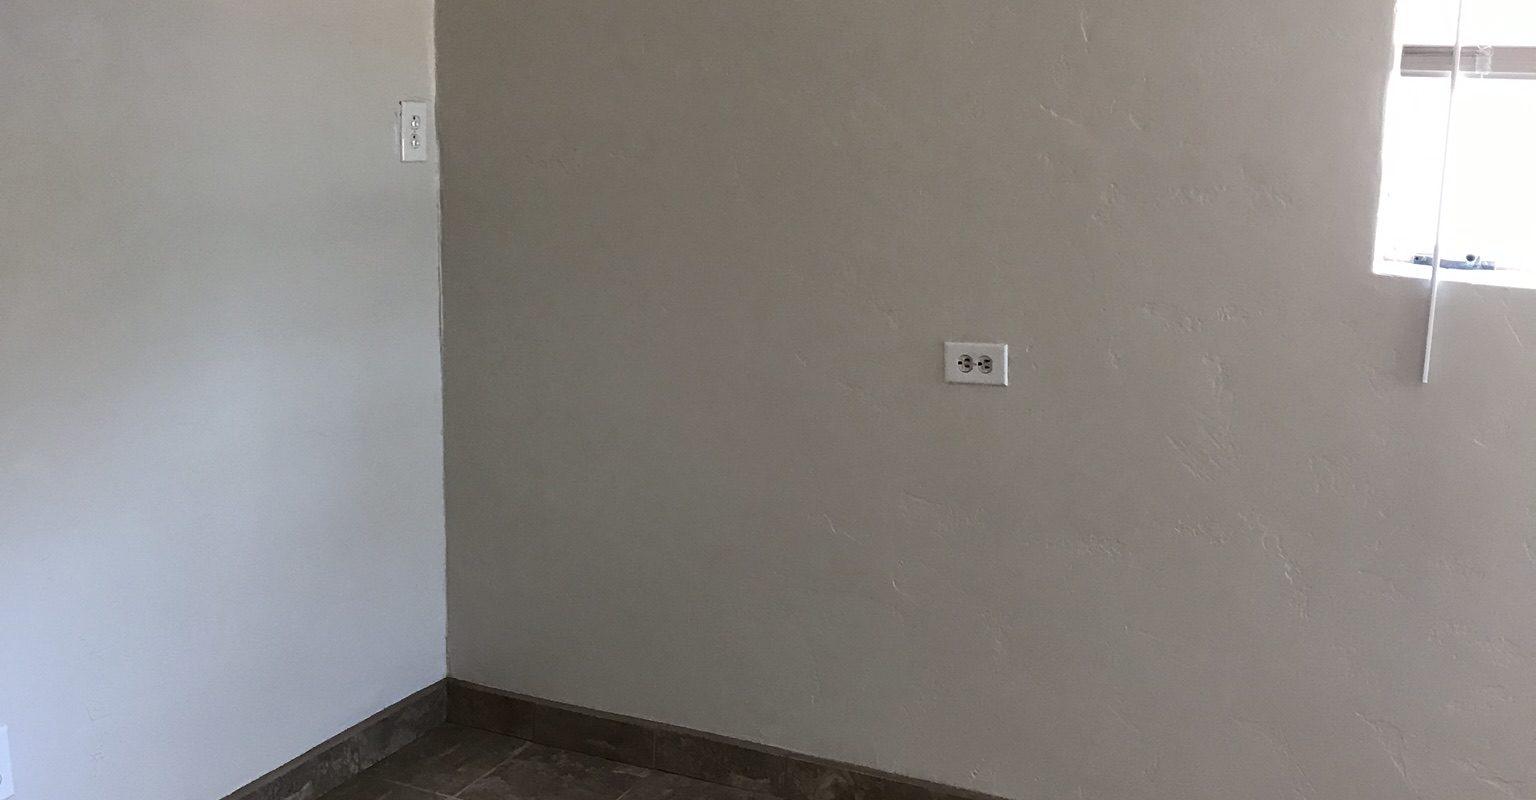 827 N. San Pedro St., Las Cruces, NM  88001